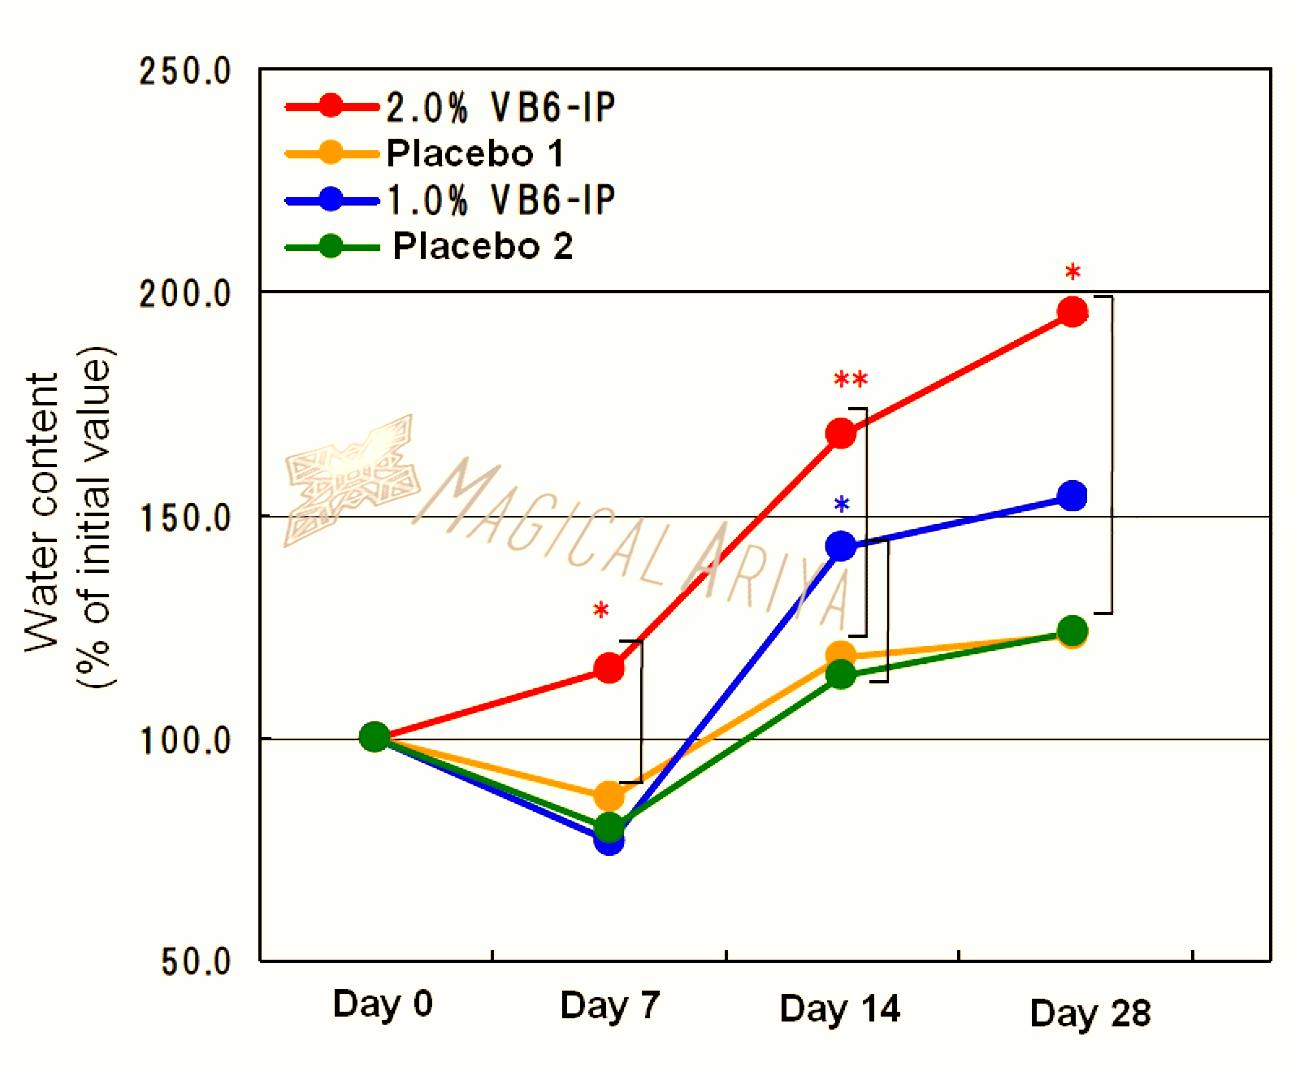 VB6-IP                            R5Untitled-1